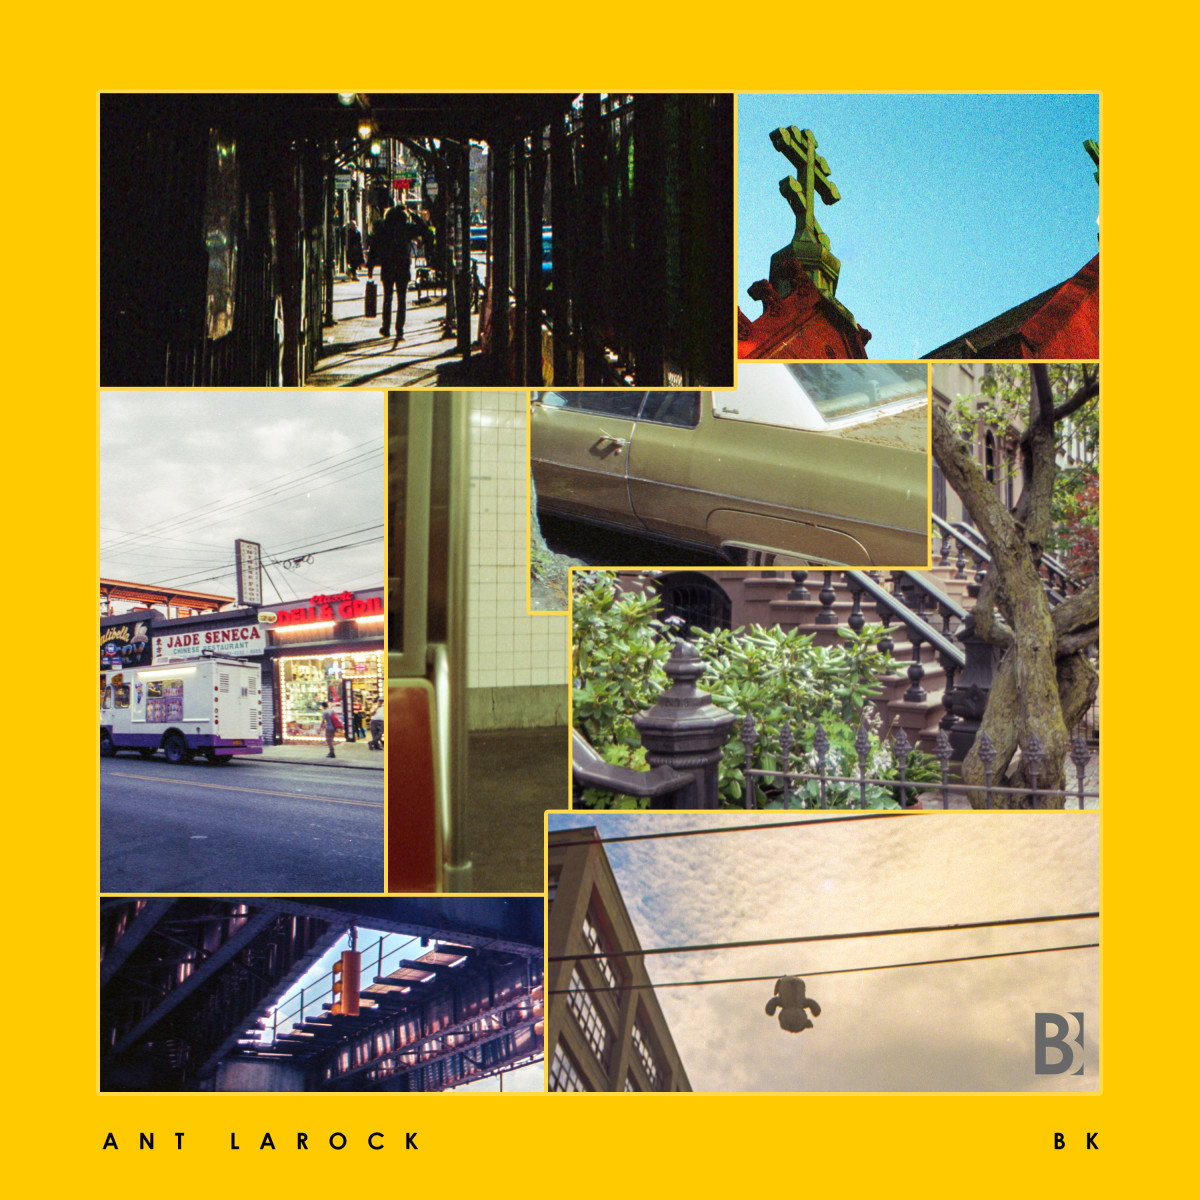 Ant LaRock - BK [Brobot Records]